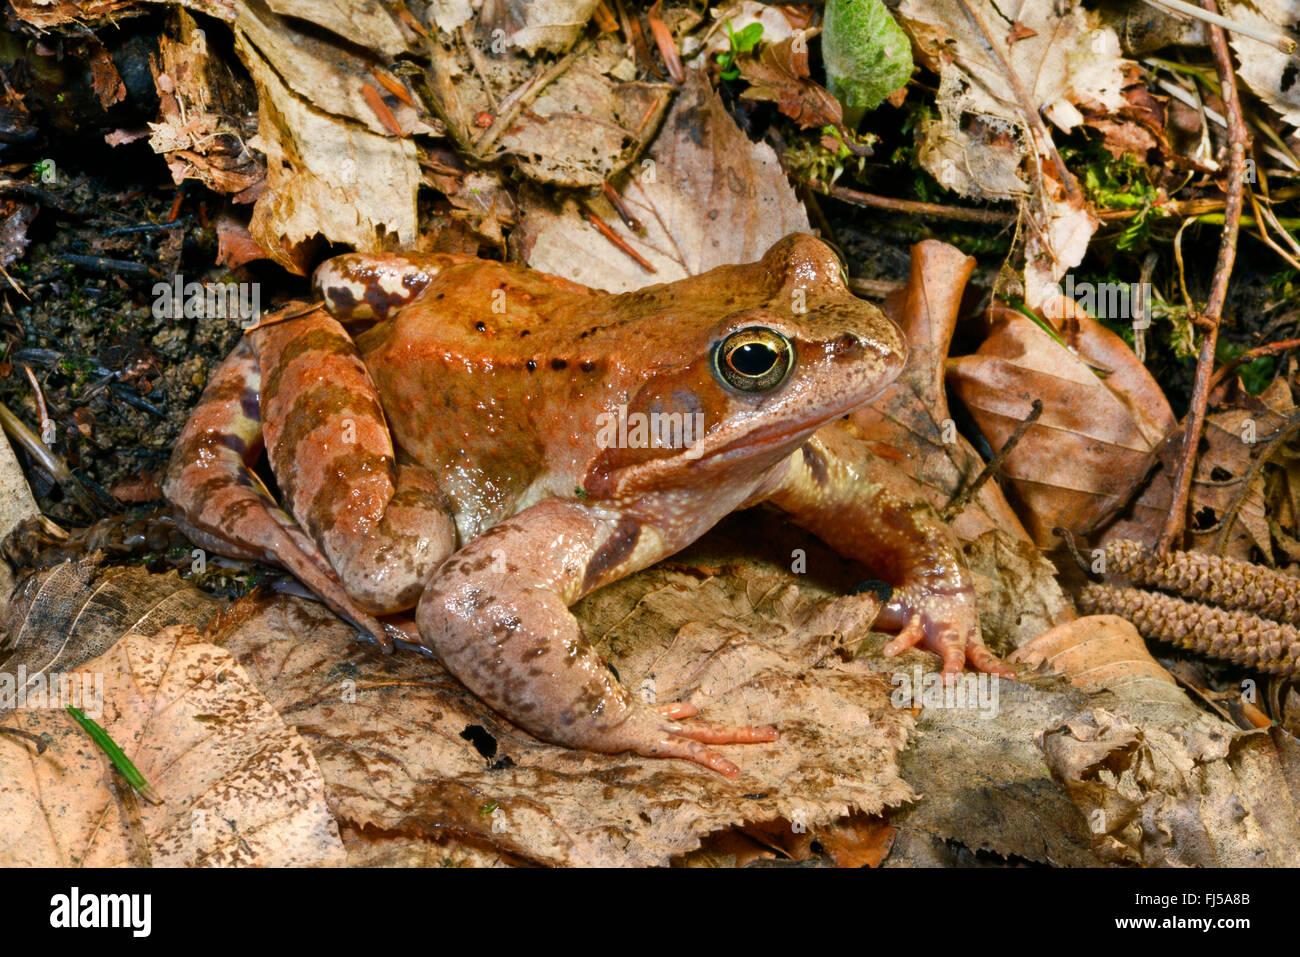 common frog, grass frog (Rana temporaria), on fallen leaves, Romania, Karpaten - Stock Image